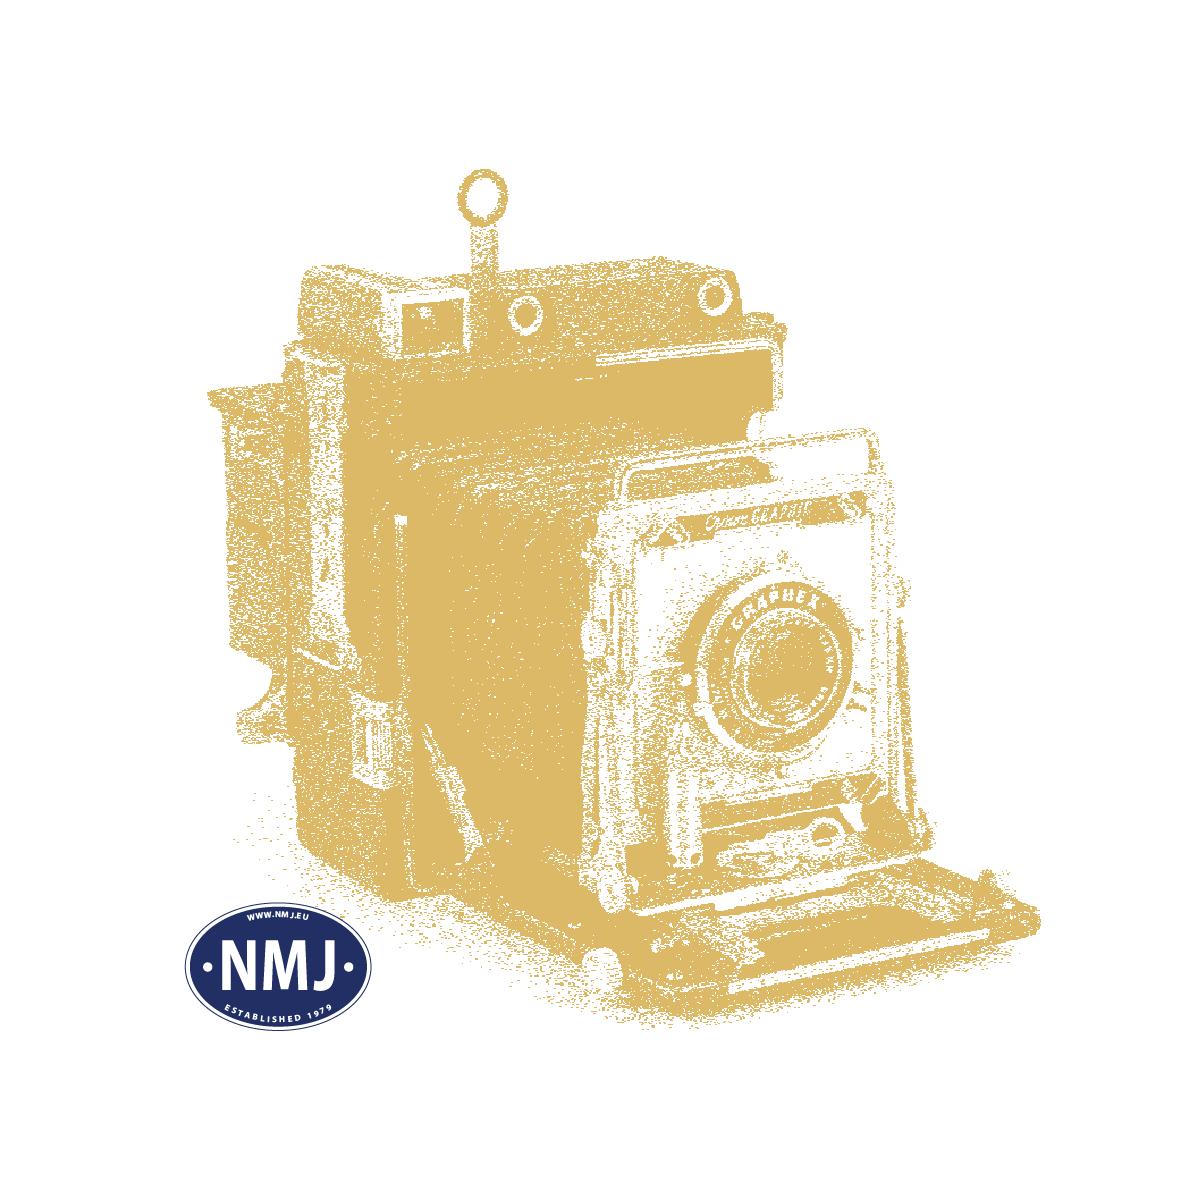 NMJT90019 - NMJ Topline NSB Di3a 617 Red/Black, DC